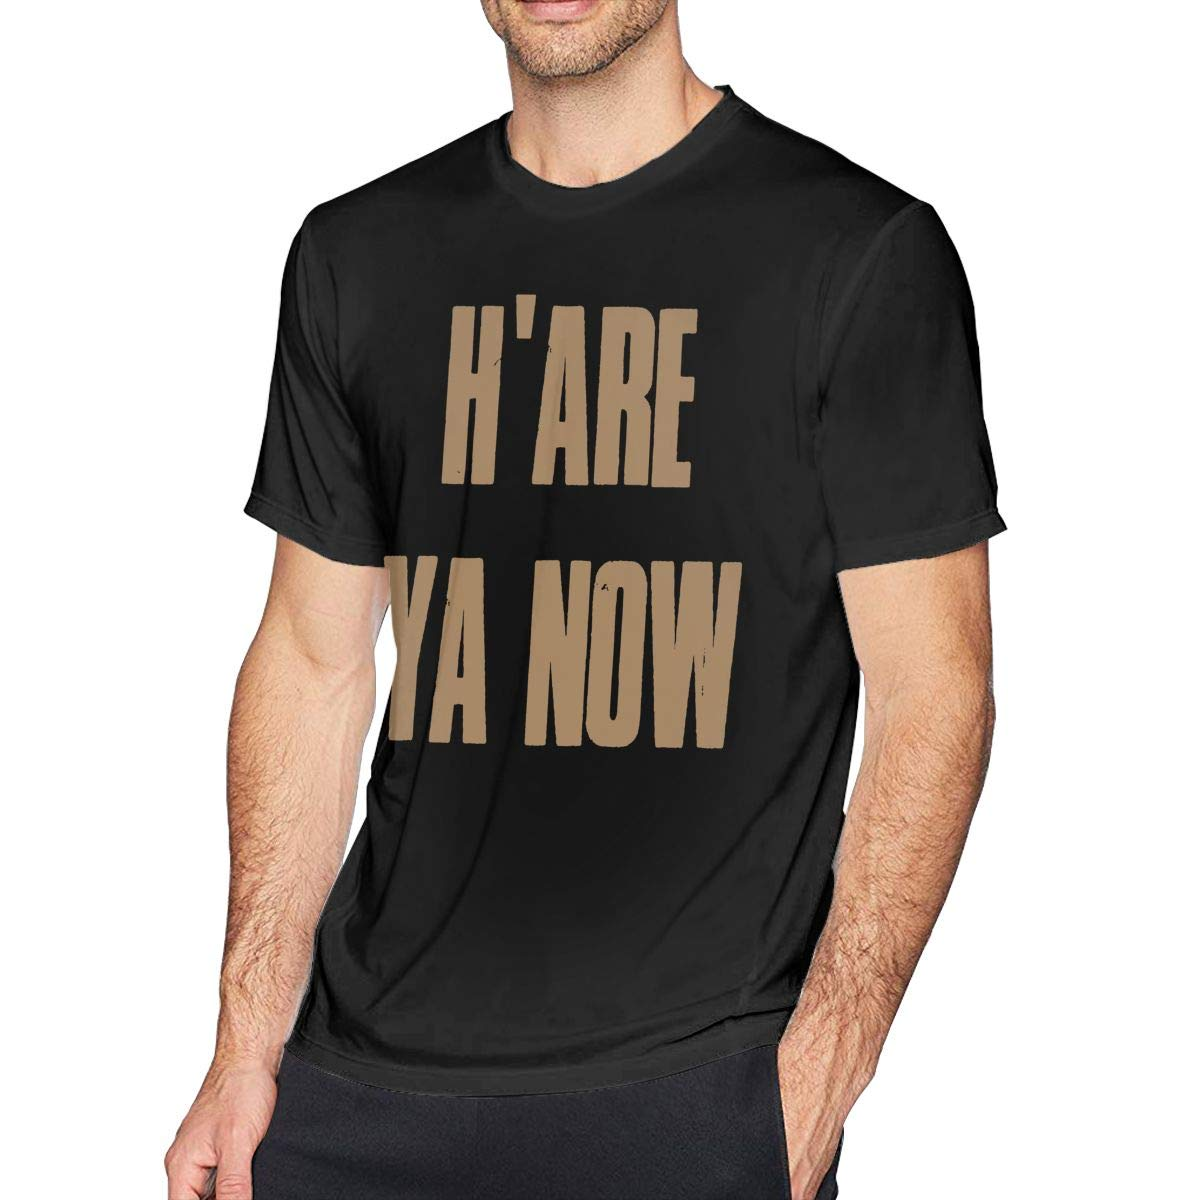 Letterkenny H Are Ya Now Short Sleeve T Shirts Plain T Shirt Tee 9325